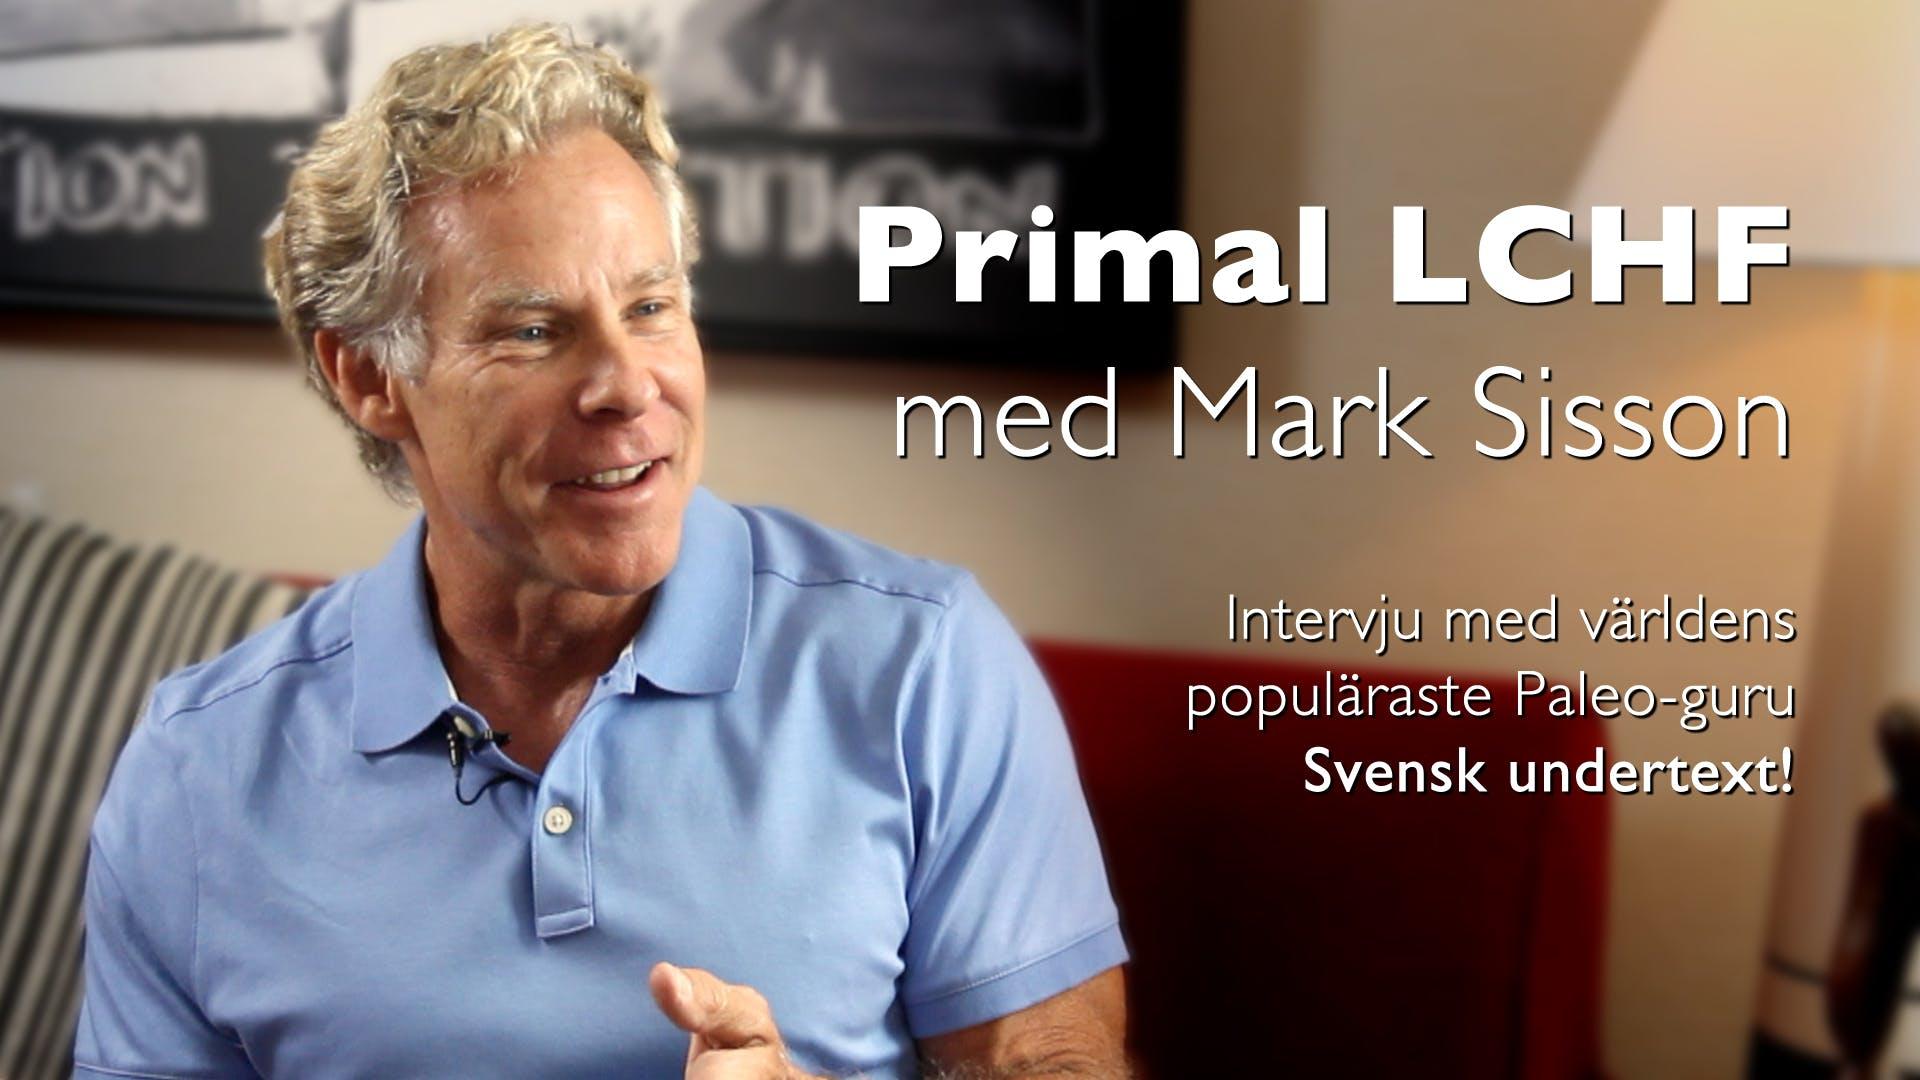 Primal LCHF med Mark Sisson